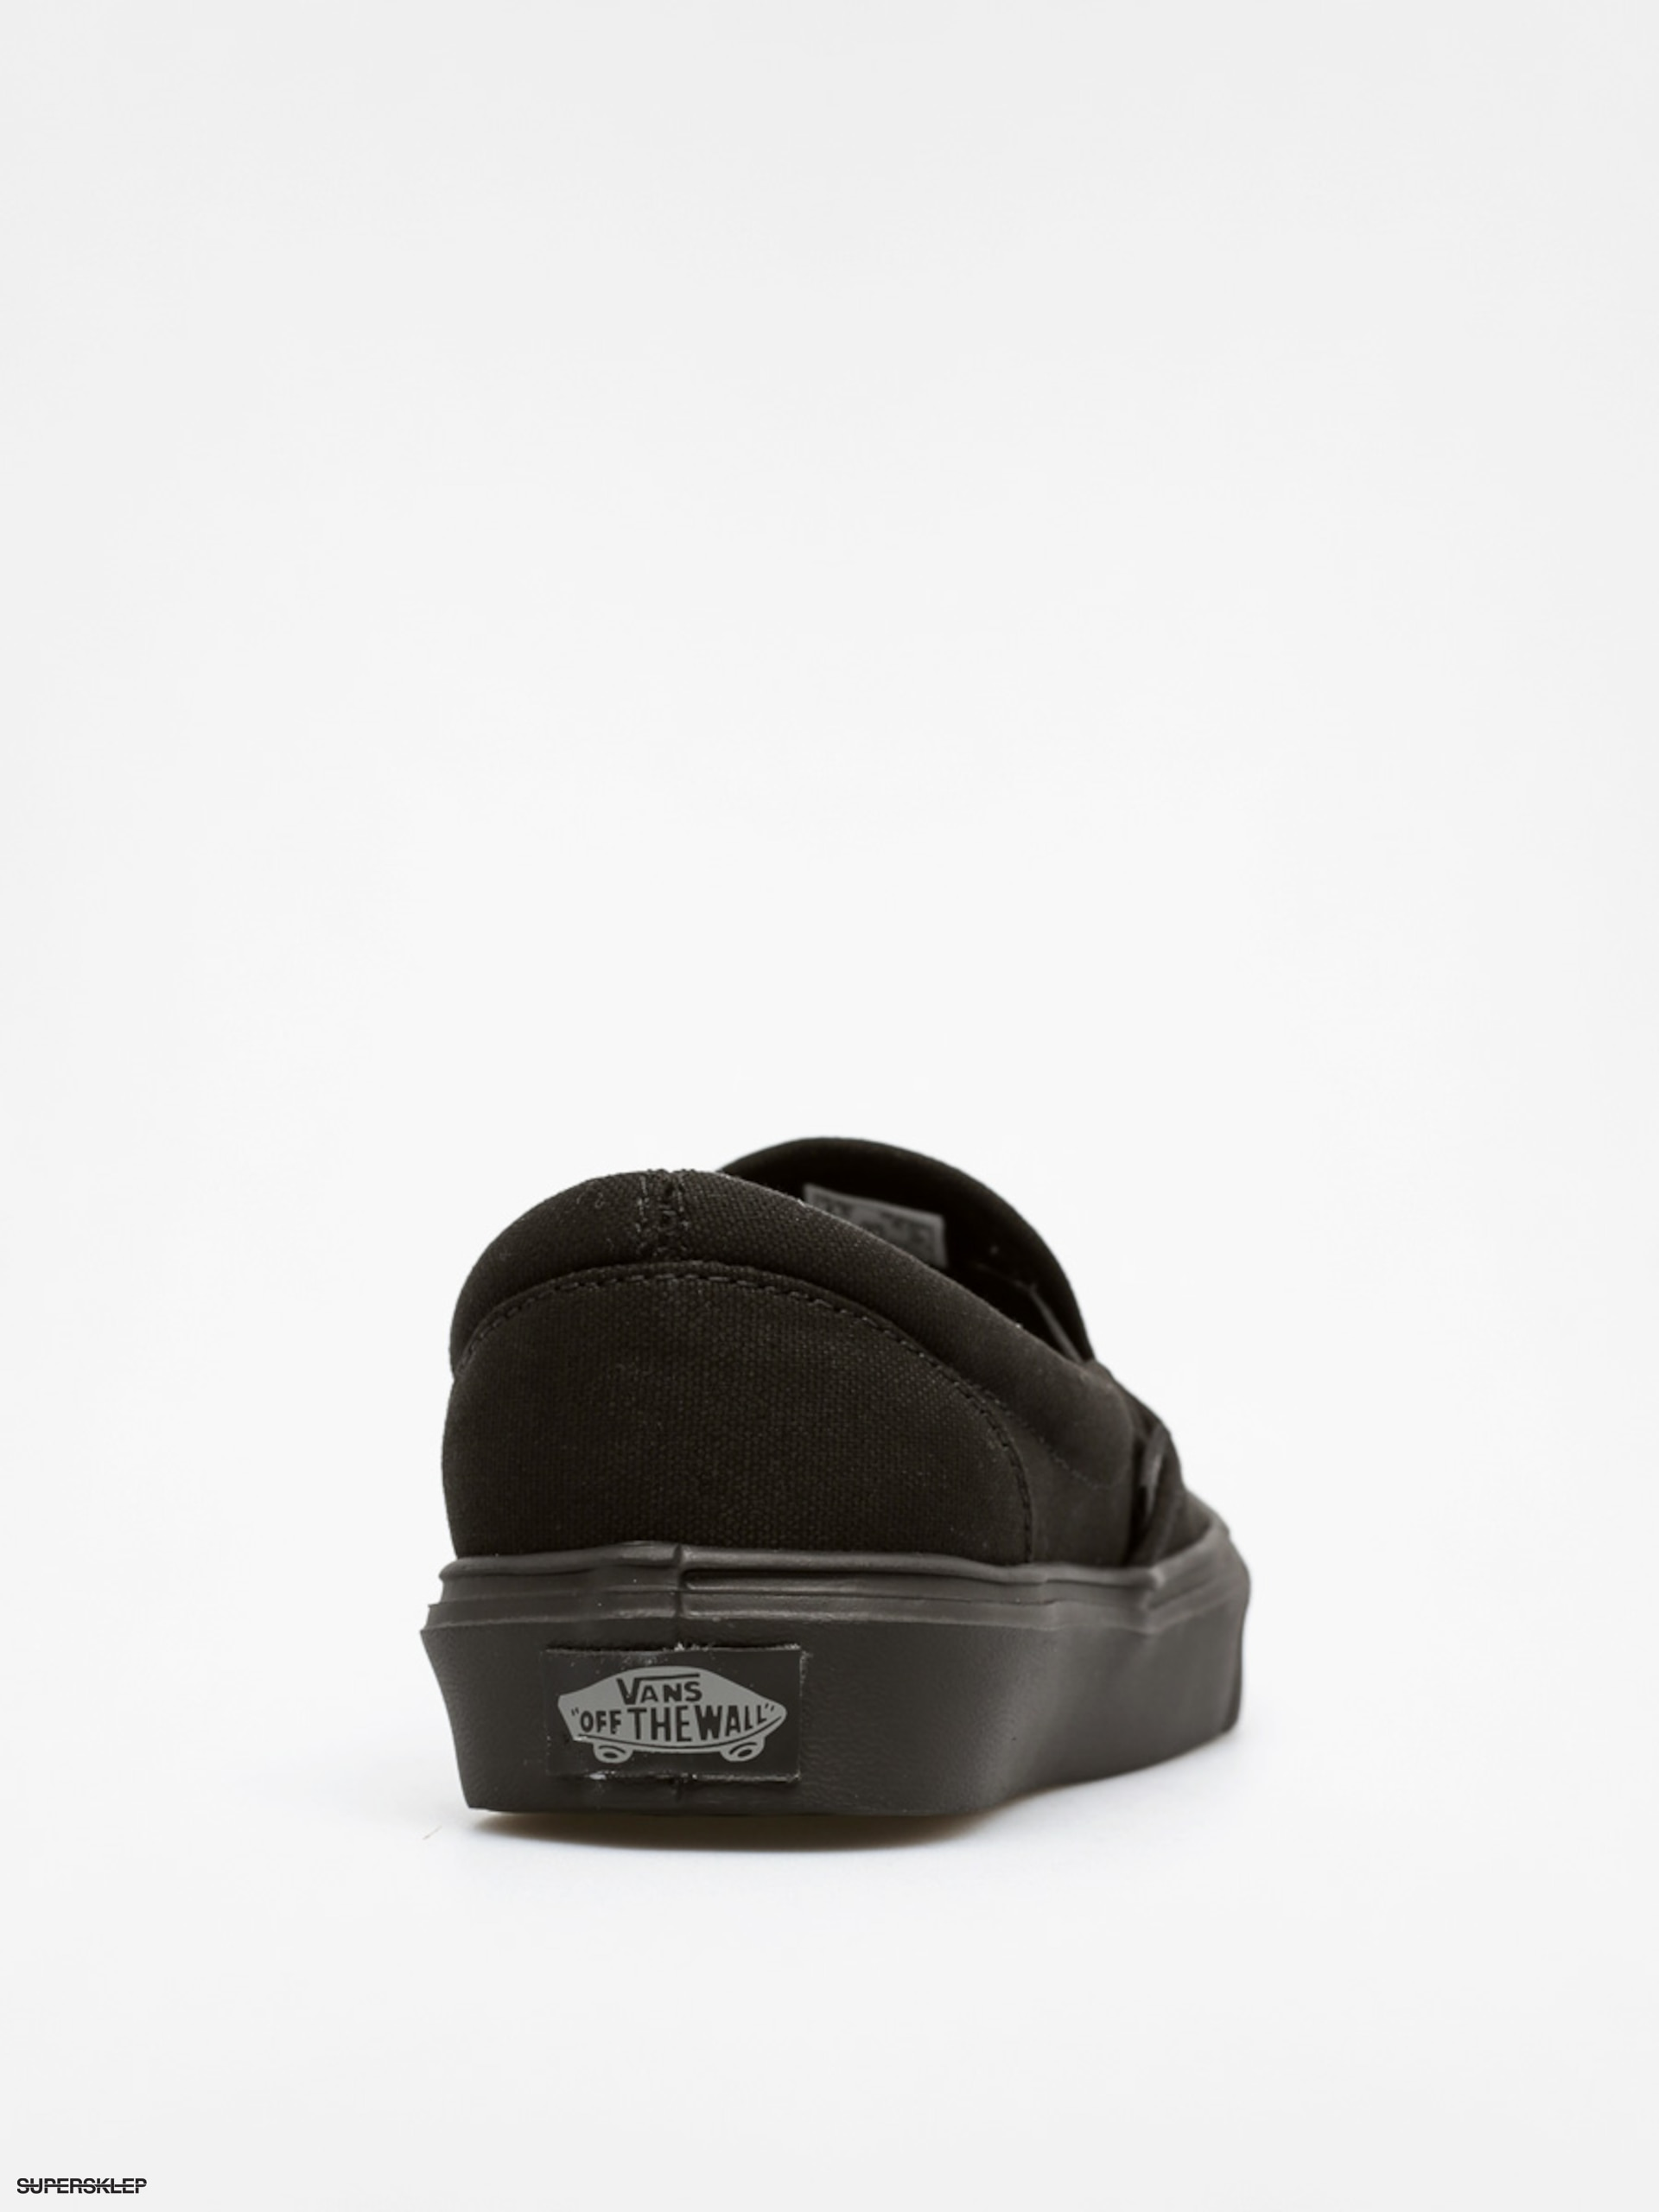 Vans Slip On Lite Leather Black Black | Footshop